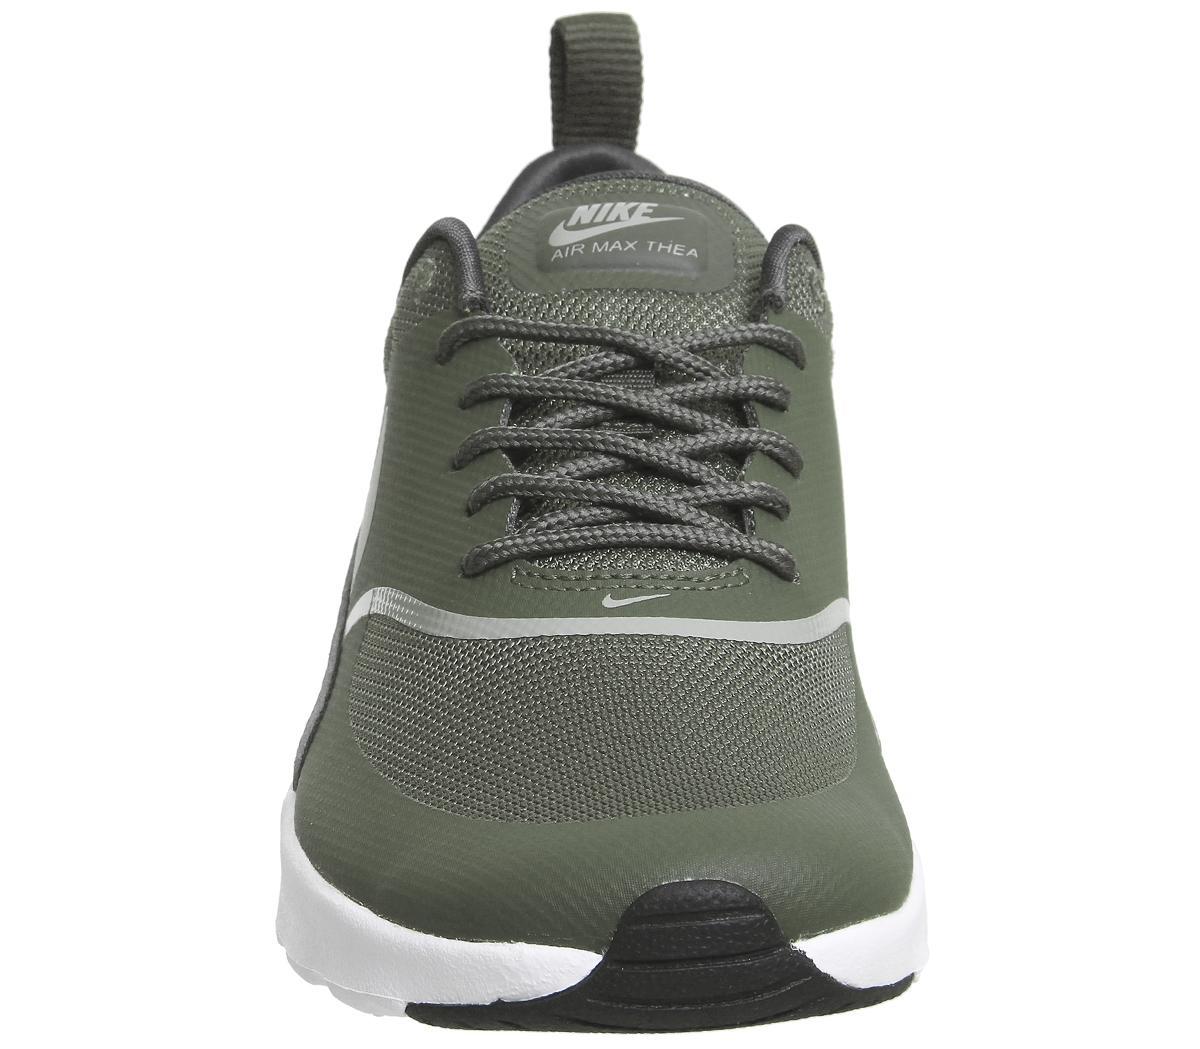 Nike Air Max Thea Trainers Cargo Khaki White Sneaker damen